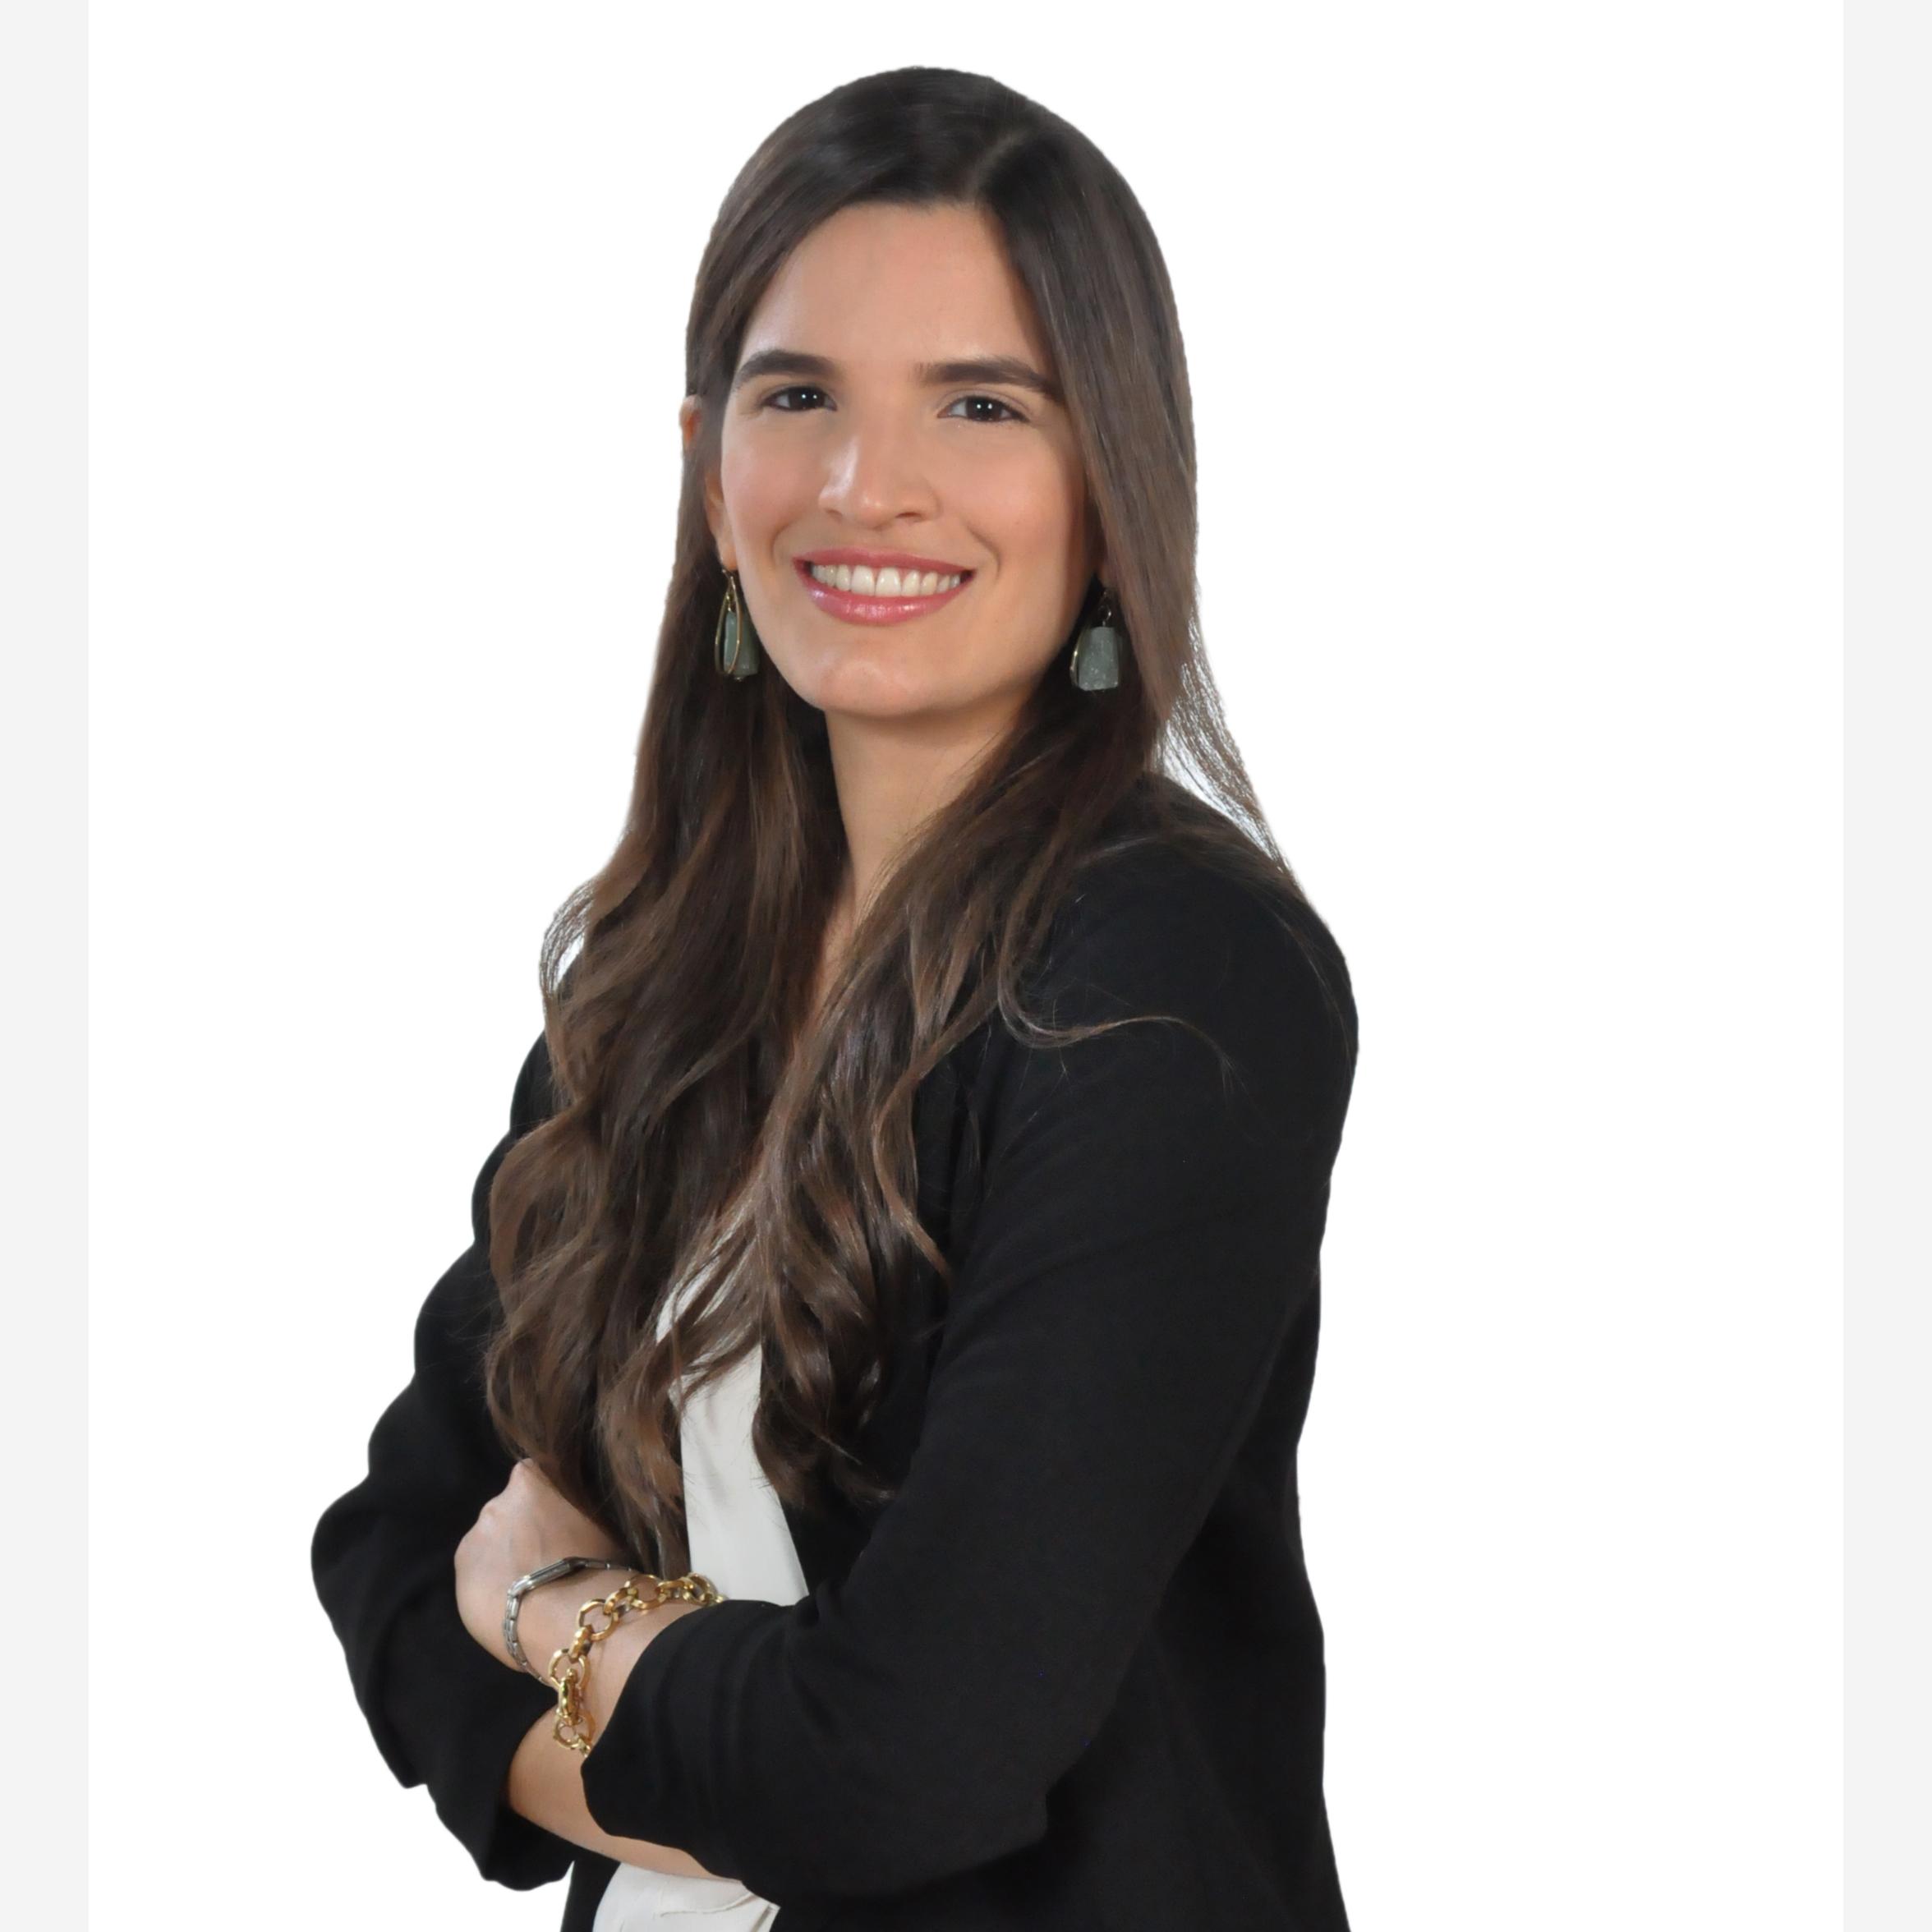 Luisa Cantisano